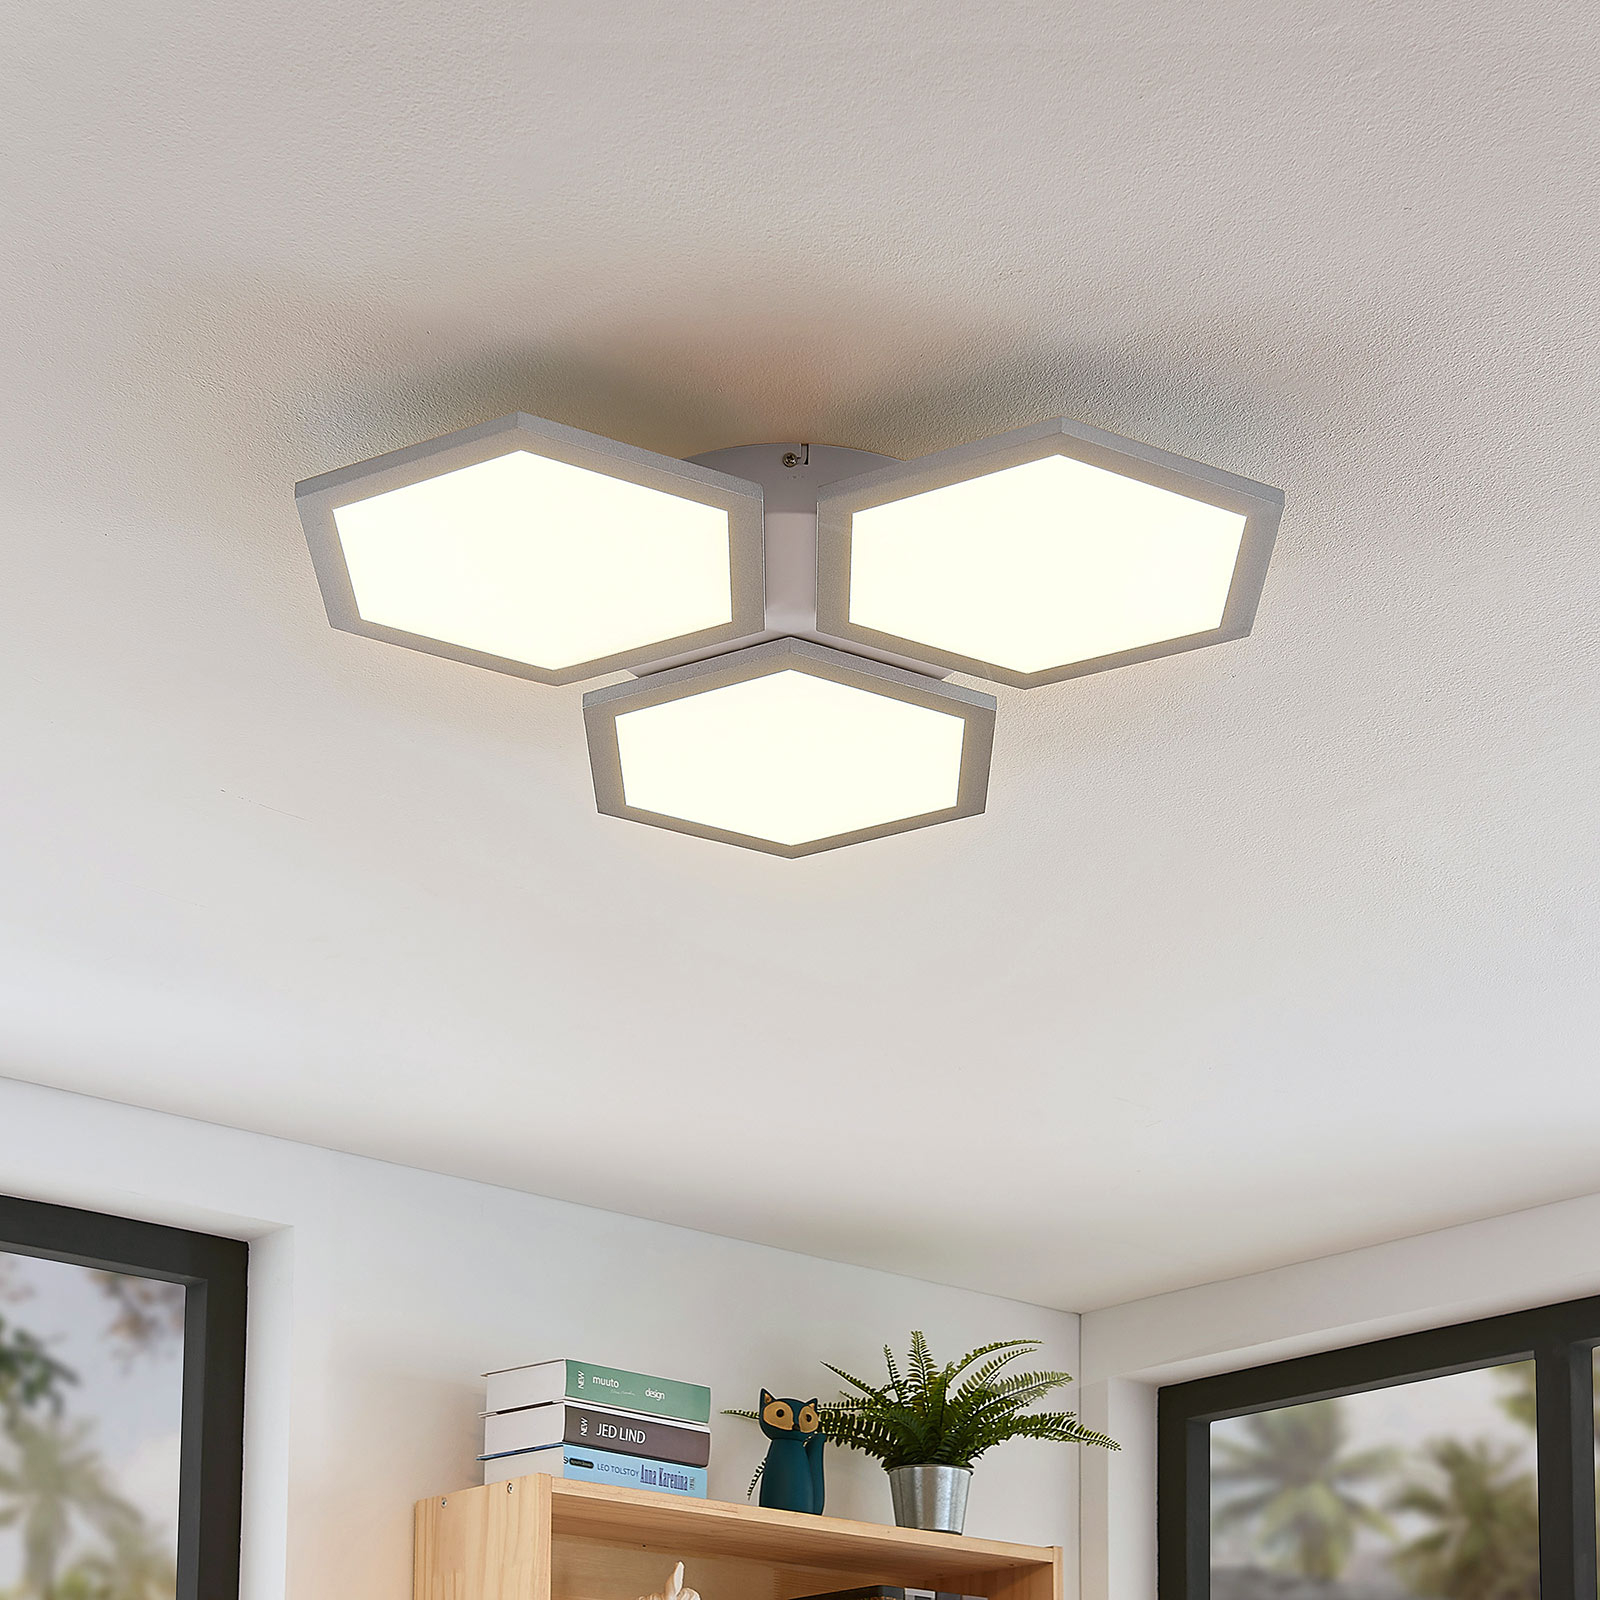 LED plafondlamp Leas, dimbaar, CCT, 3 lampjes